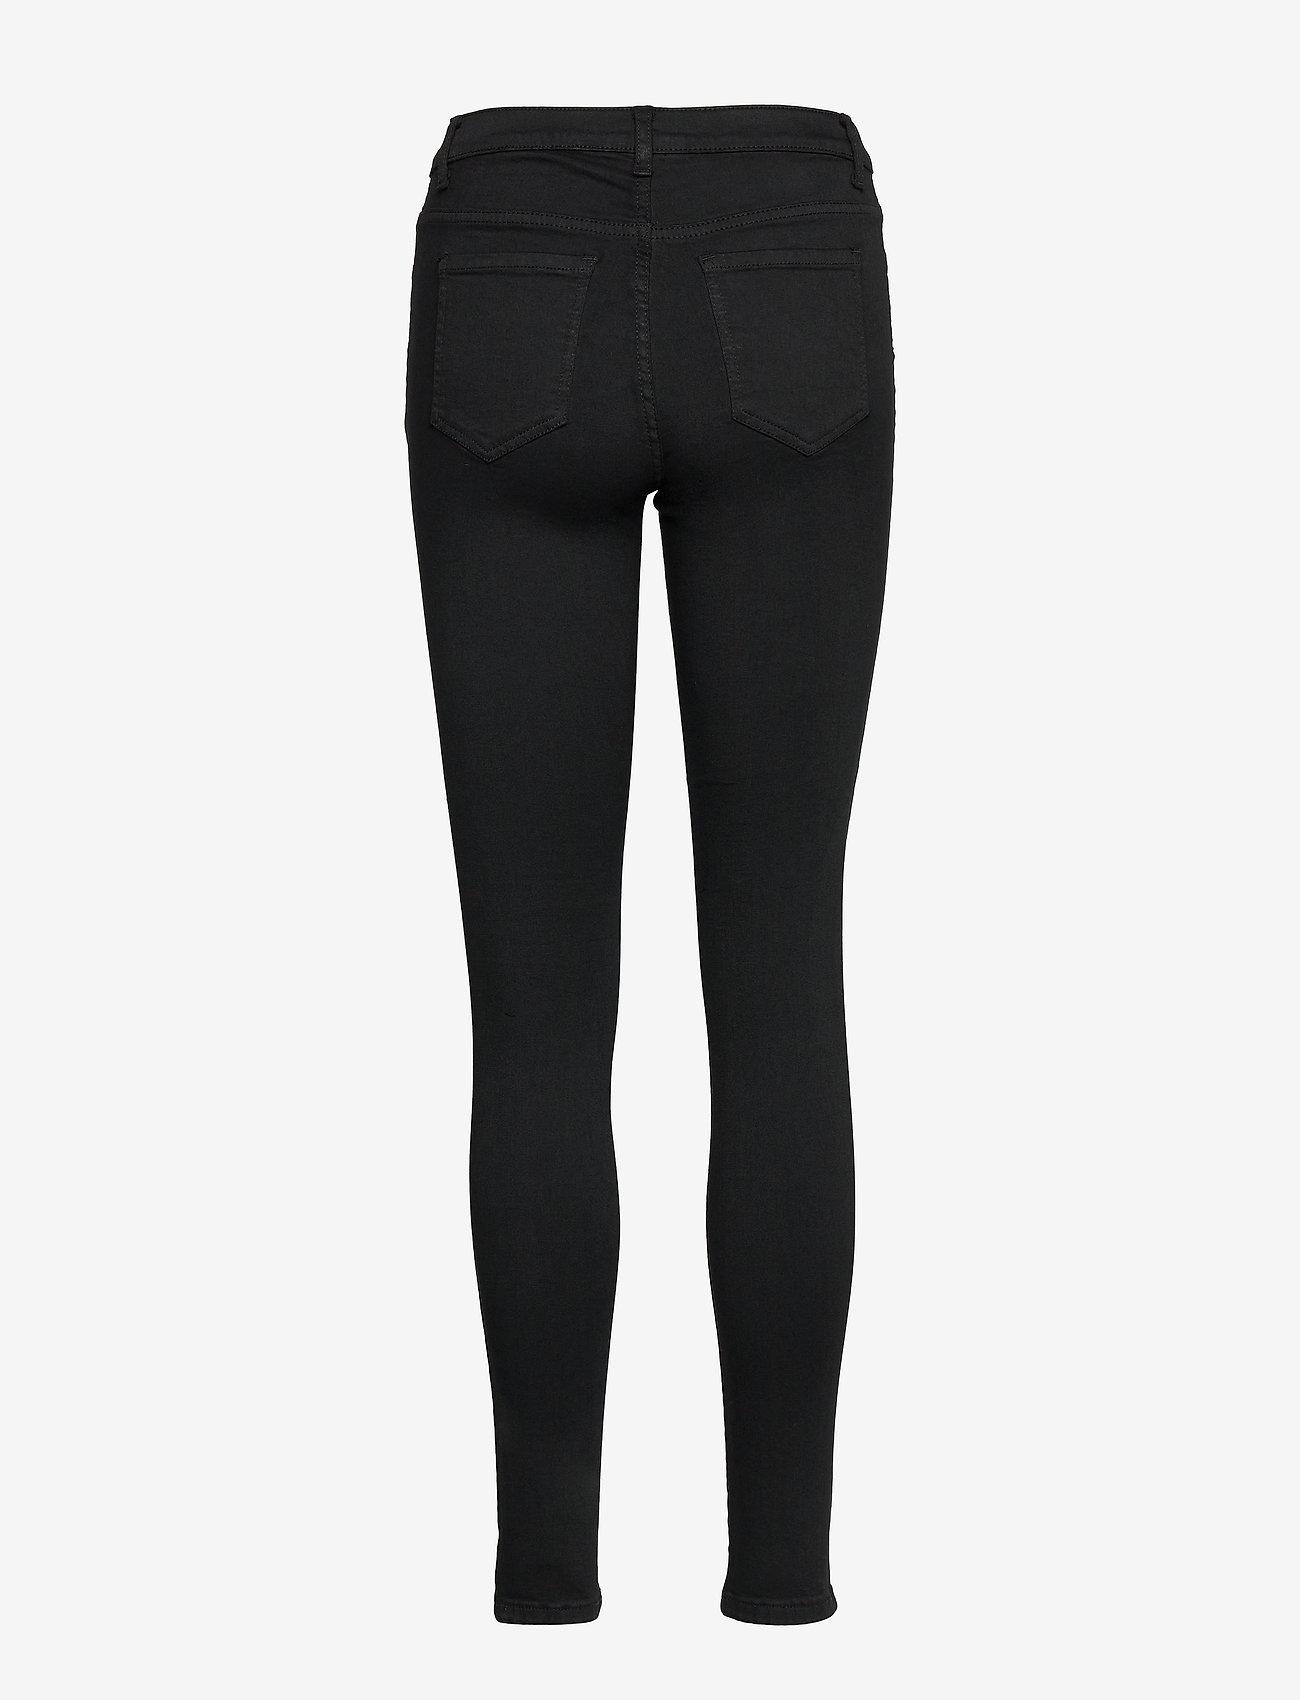 SPARKZ COPENHAGEN - CHRISTA BLACK PANTS - broeken med skinny fit - black - 1